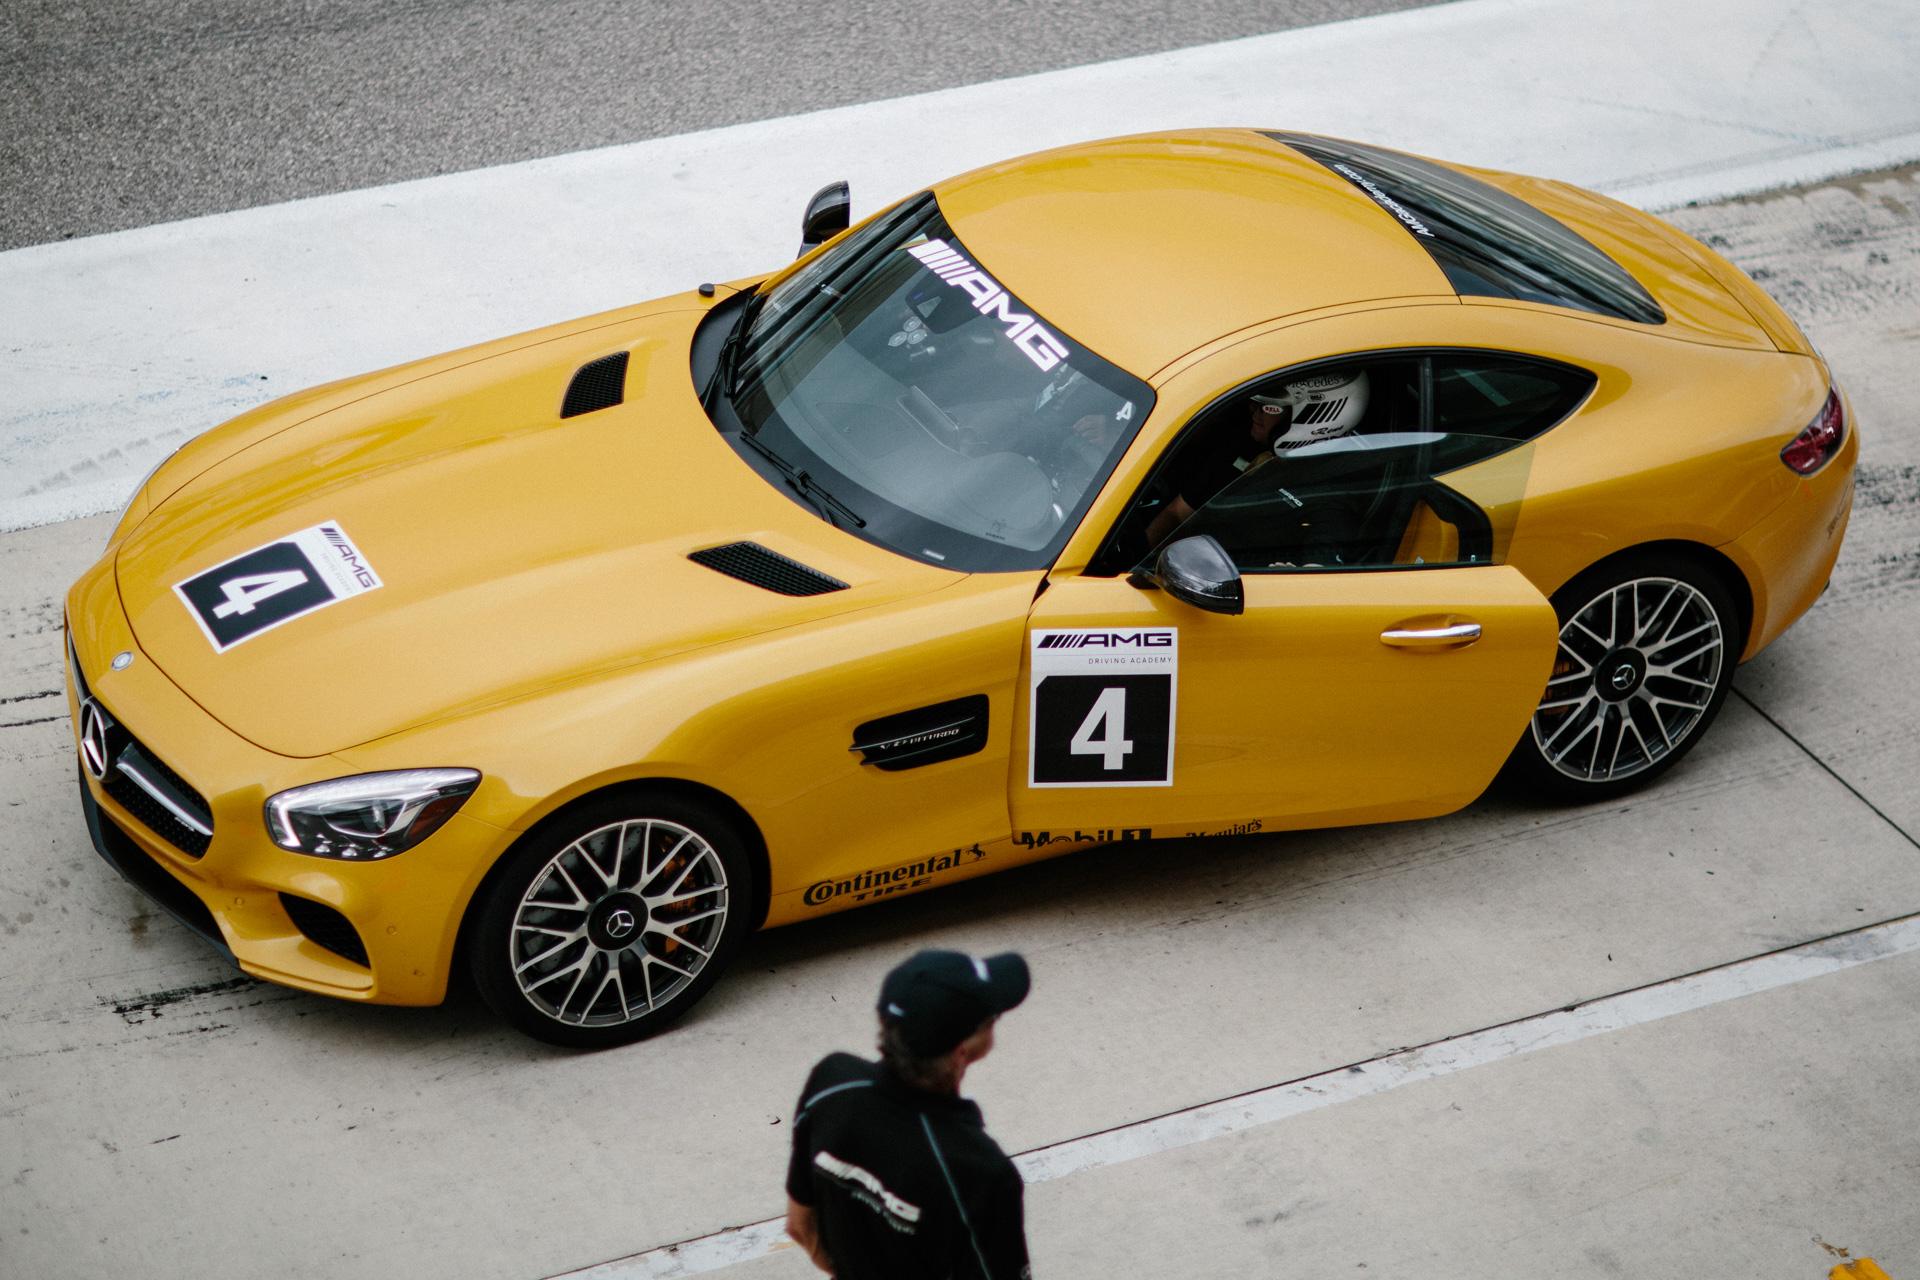 Mercedes_Benz_AMG_2017_Edits (10 of 23).jpg